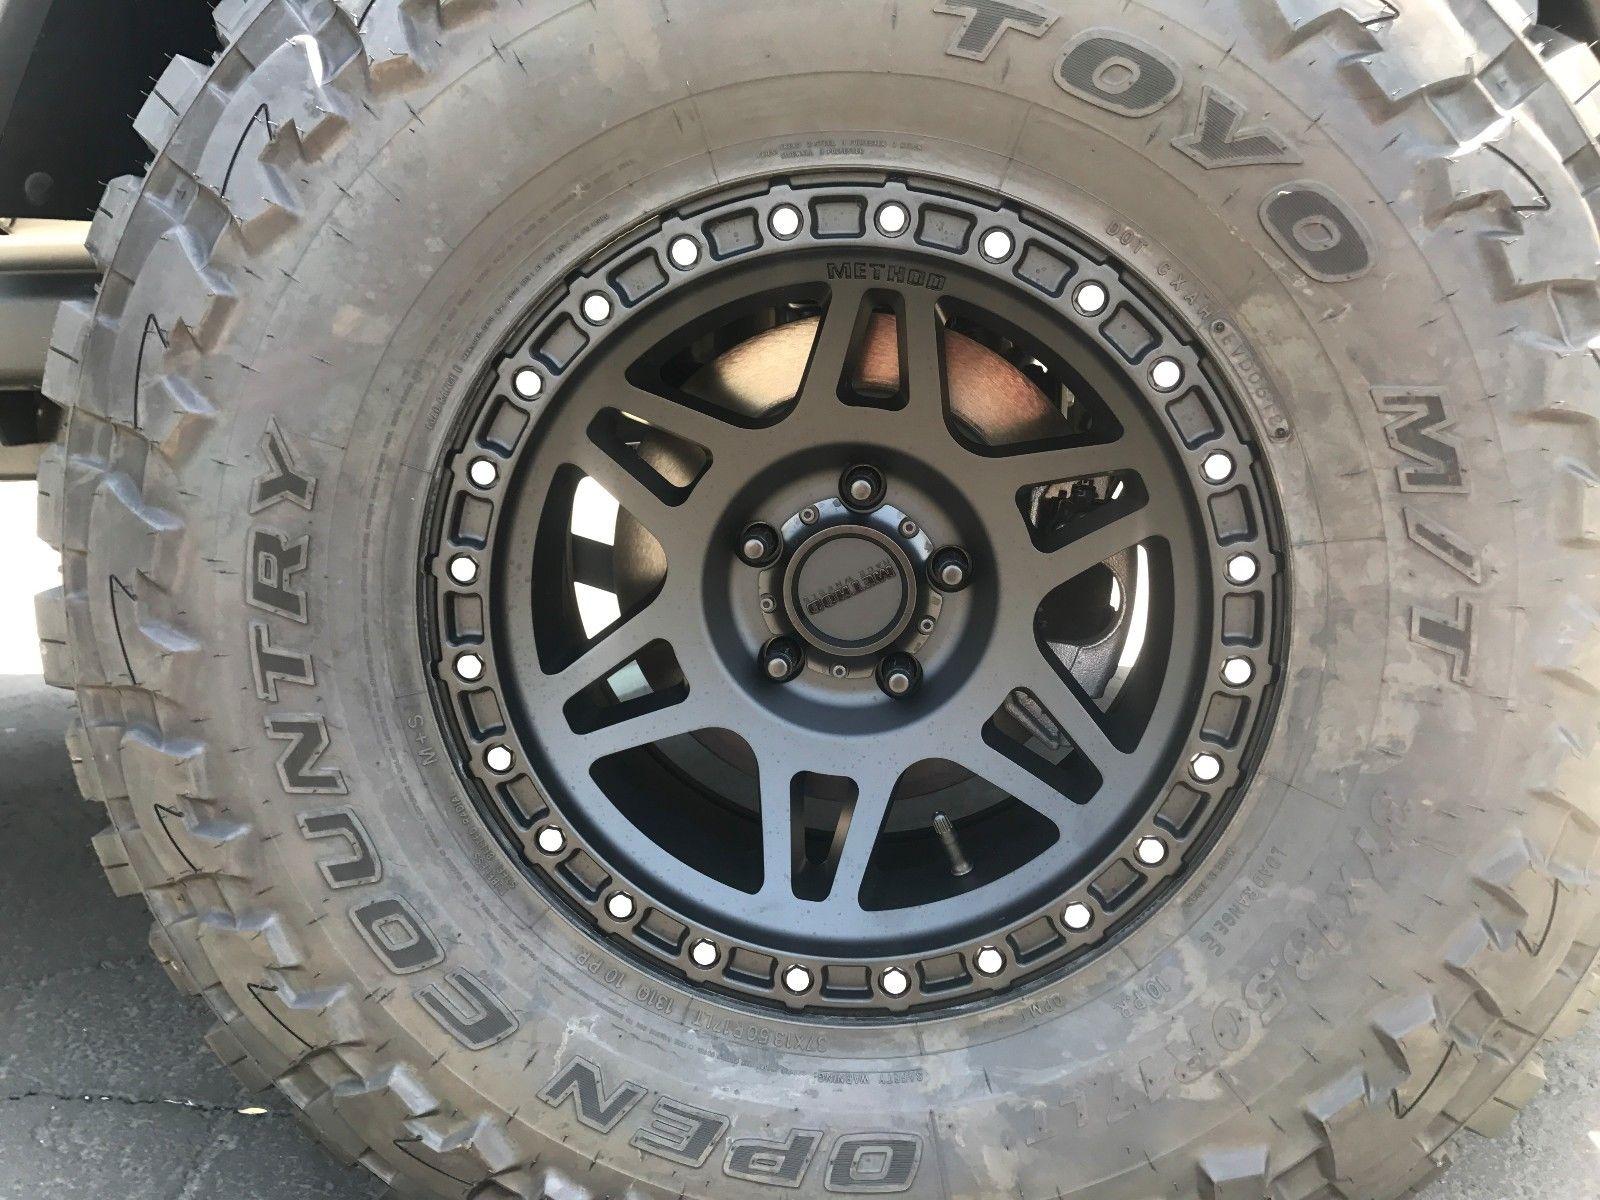 2016 Honda Accord Sport For Sale >> Used 2018 Jeep Wrangler Rubicon 2018 Jeep Wrangler Unlimited Rubicon JL with ICON Lift Method ...